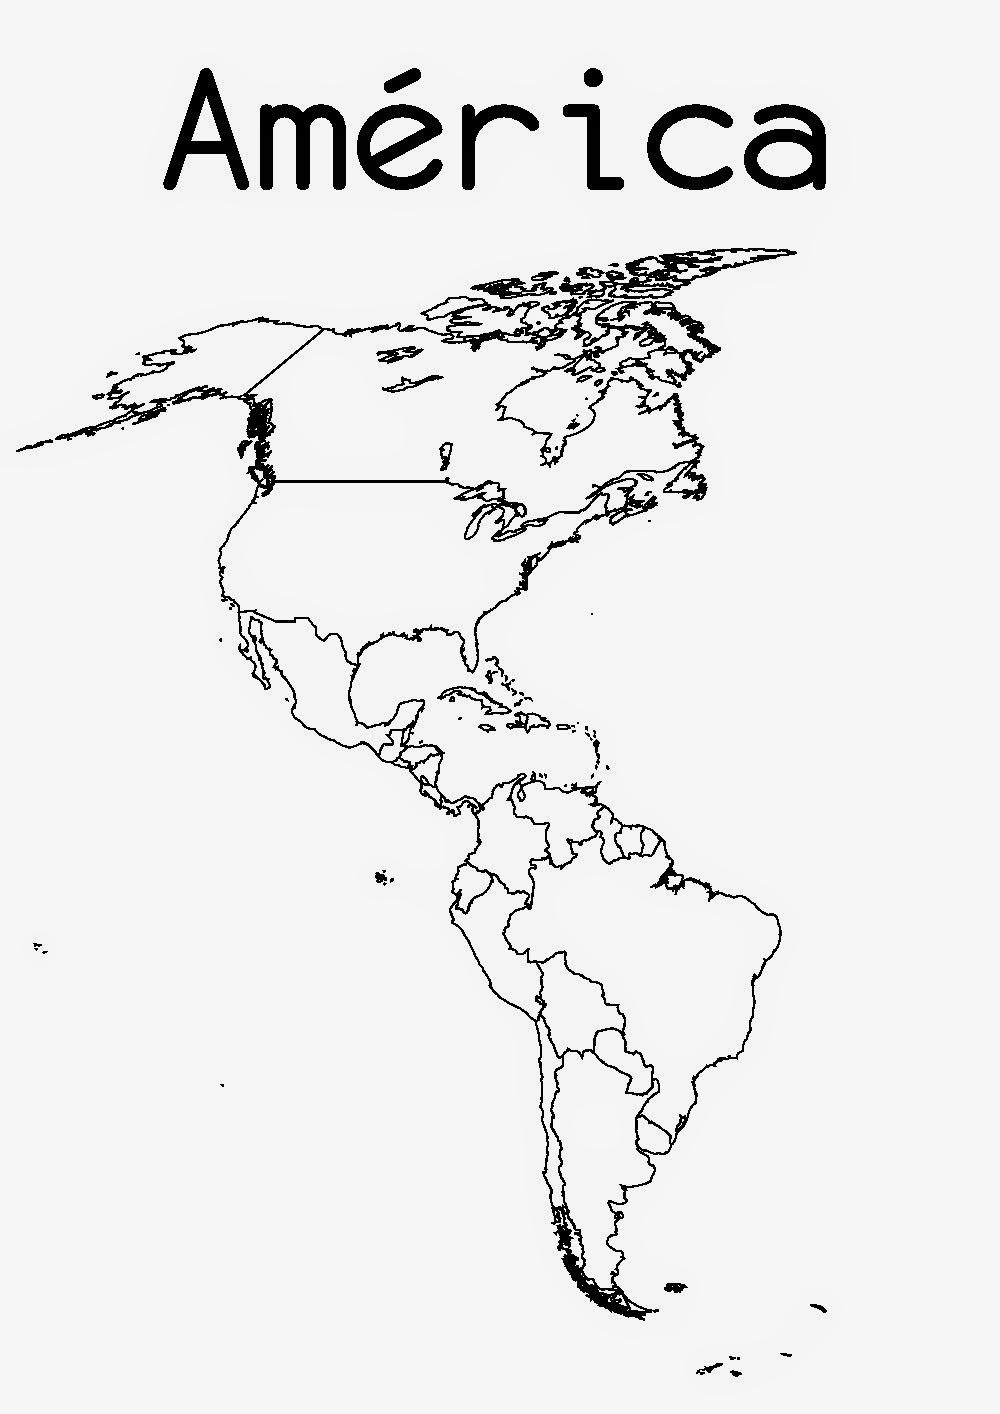 Mapas Mudos de los Continentes para Imprimir  Todosobresalientecom